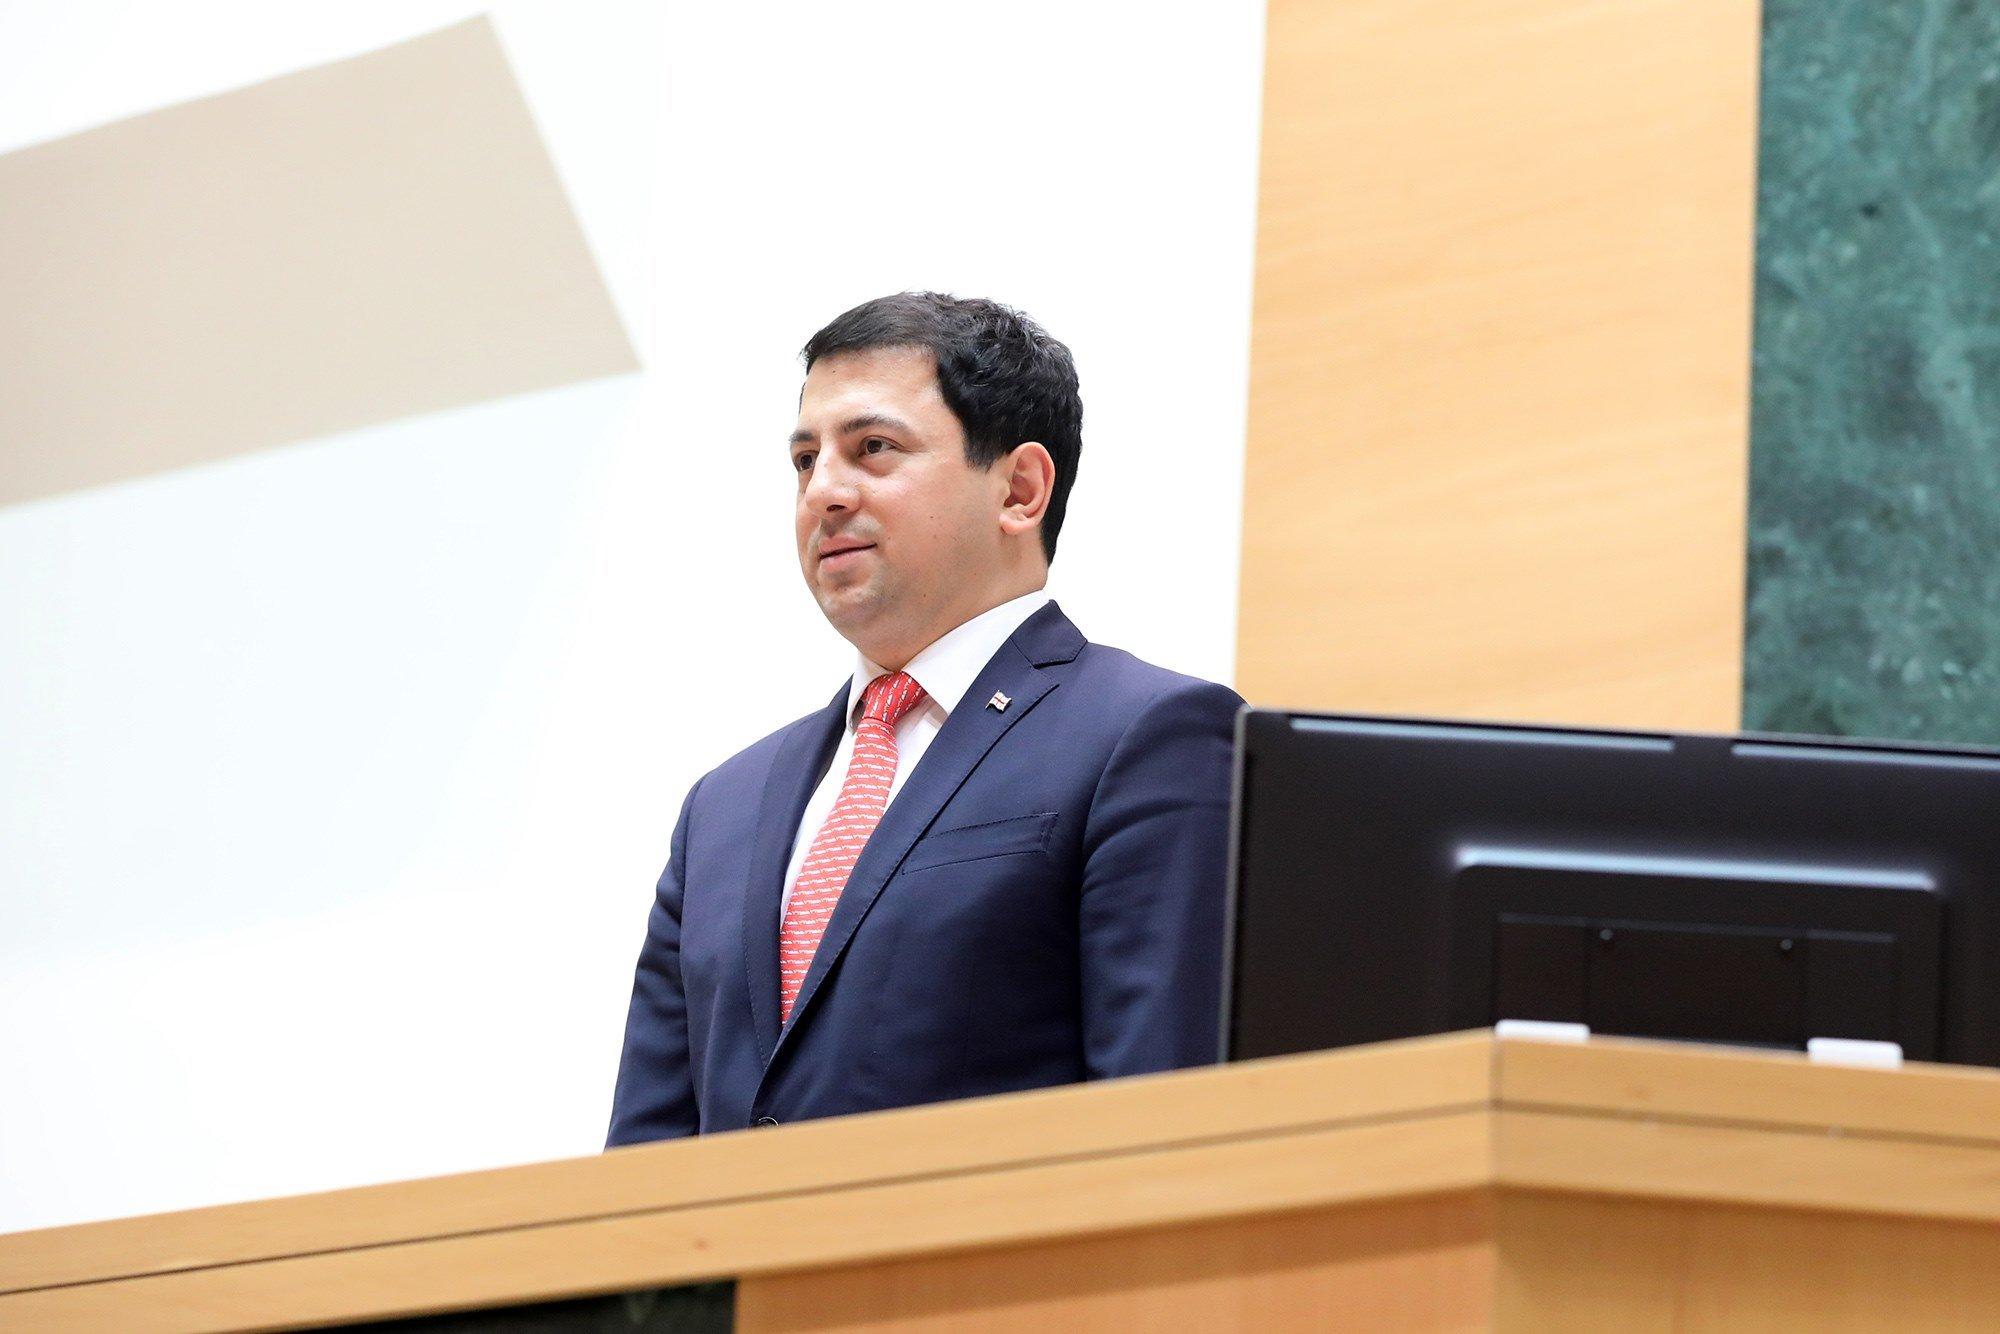 Archil Talakvadze 4 #новости Арчил Талаквадзе, Выборы 2020, коронавирус, коронавирус в Грузии